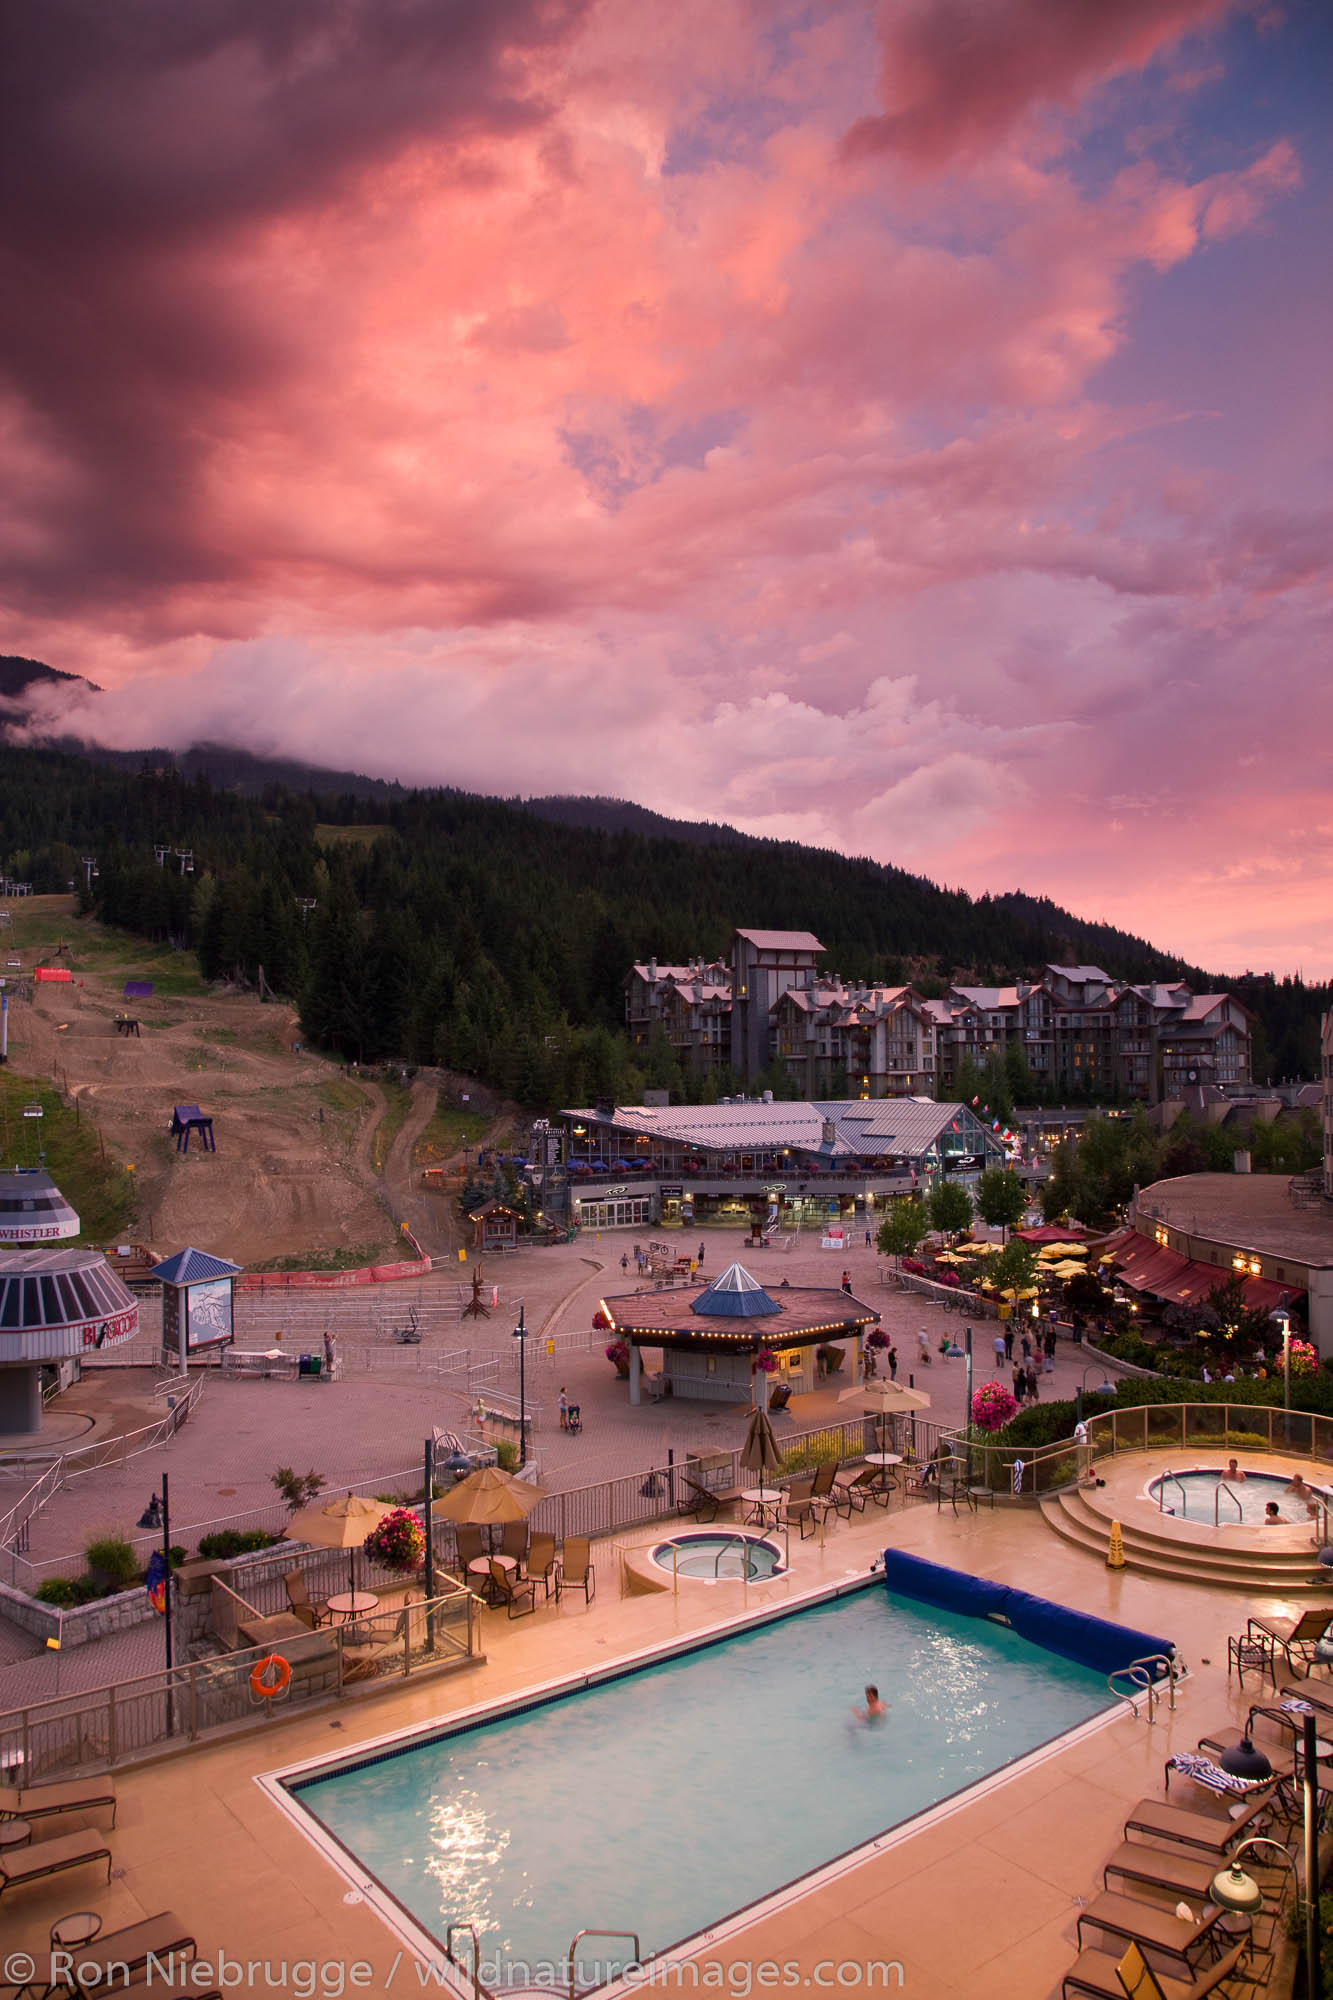 Sunset over Whistler Village, Whistler, British Columbia, Canada.